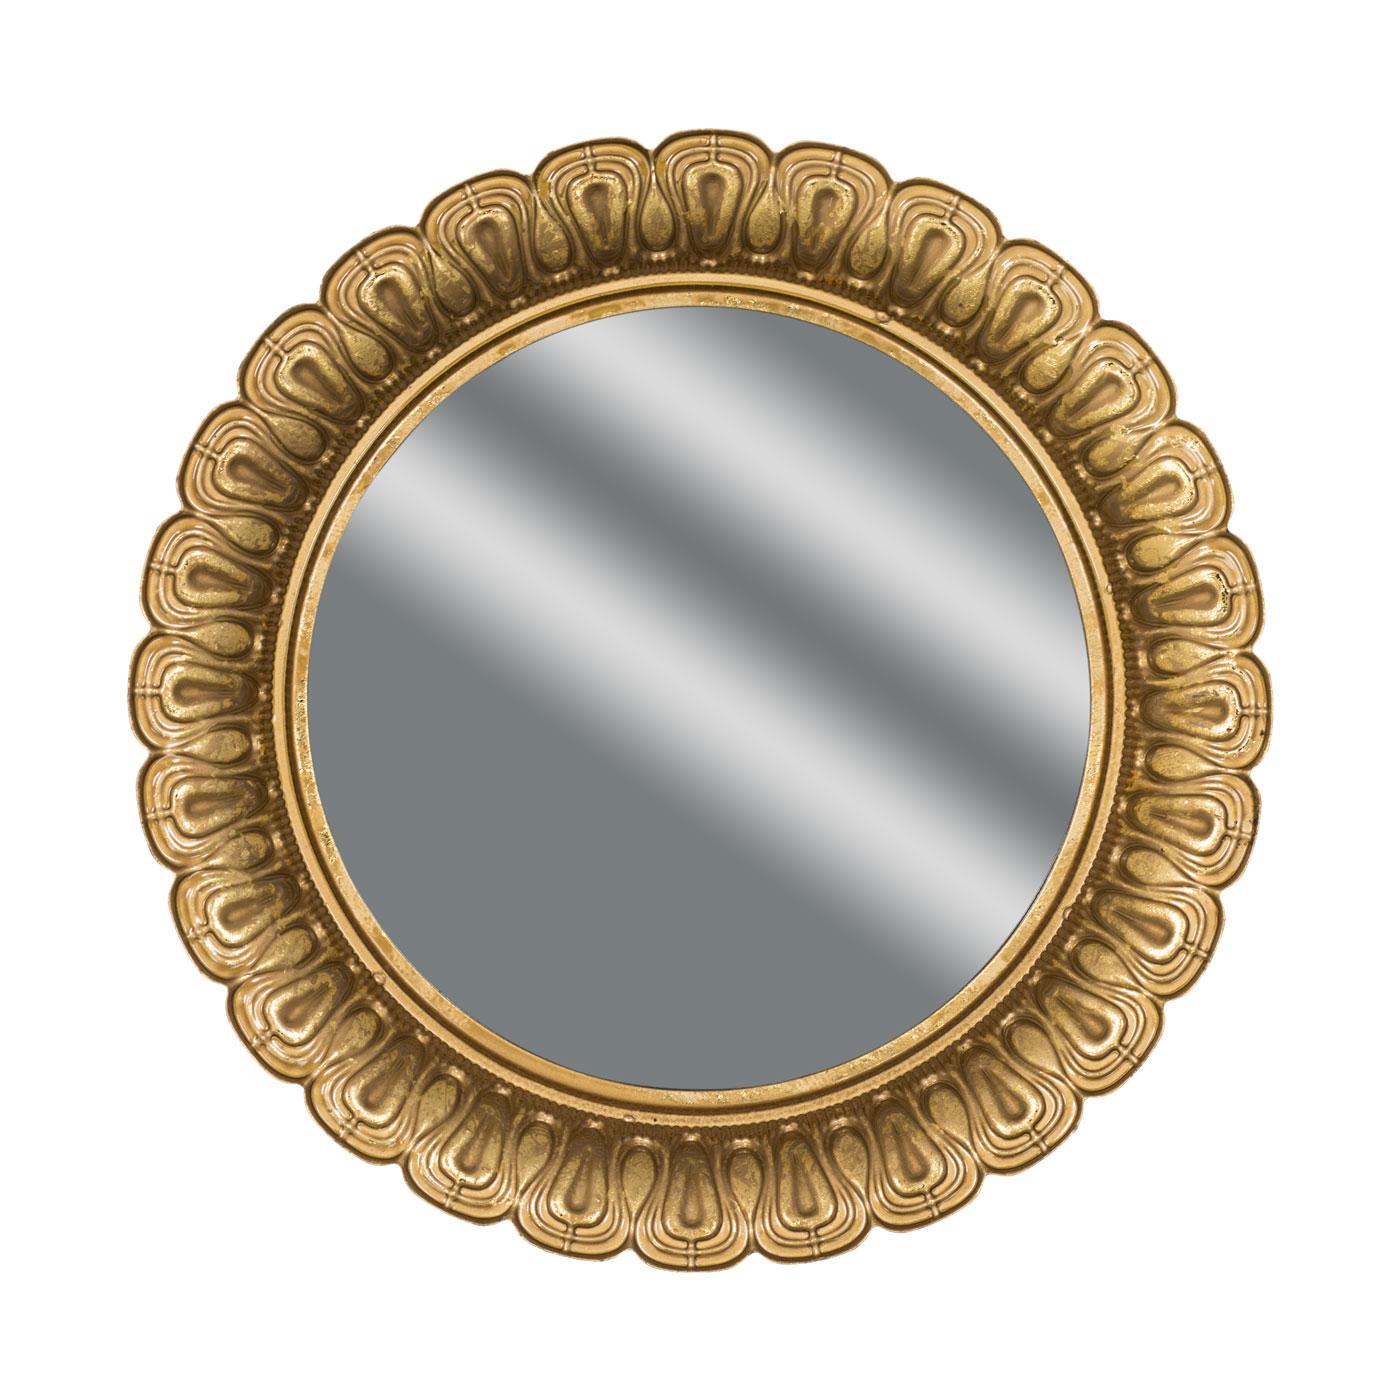 Купить Зеркала Home Philosophy, Зеркало Tate Цвет: Золотой (35х5 см), Китай, Металл, Зеркало